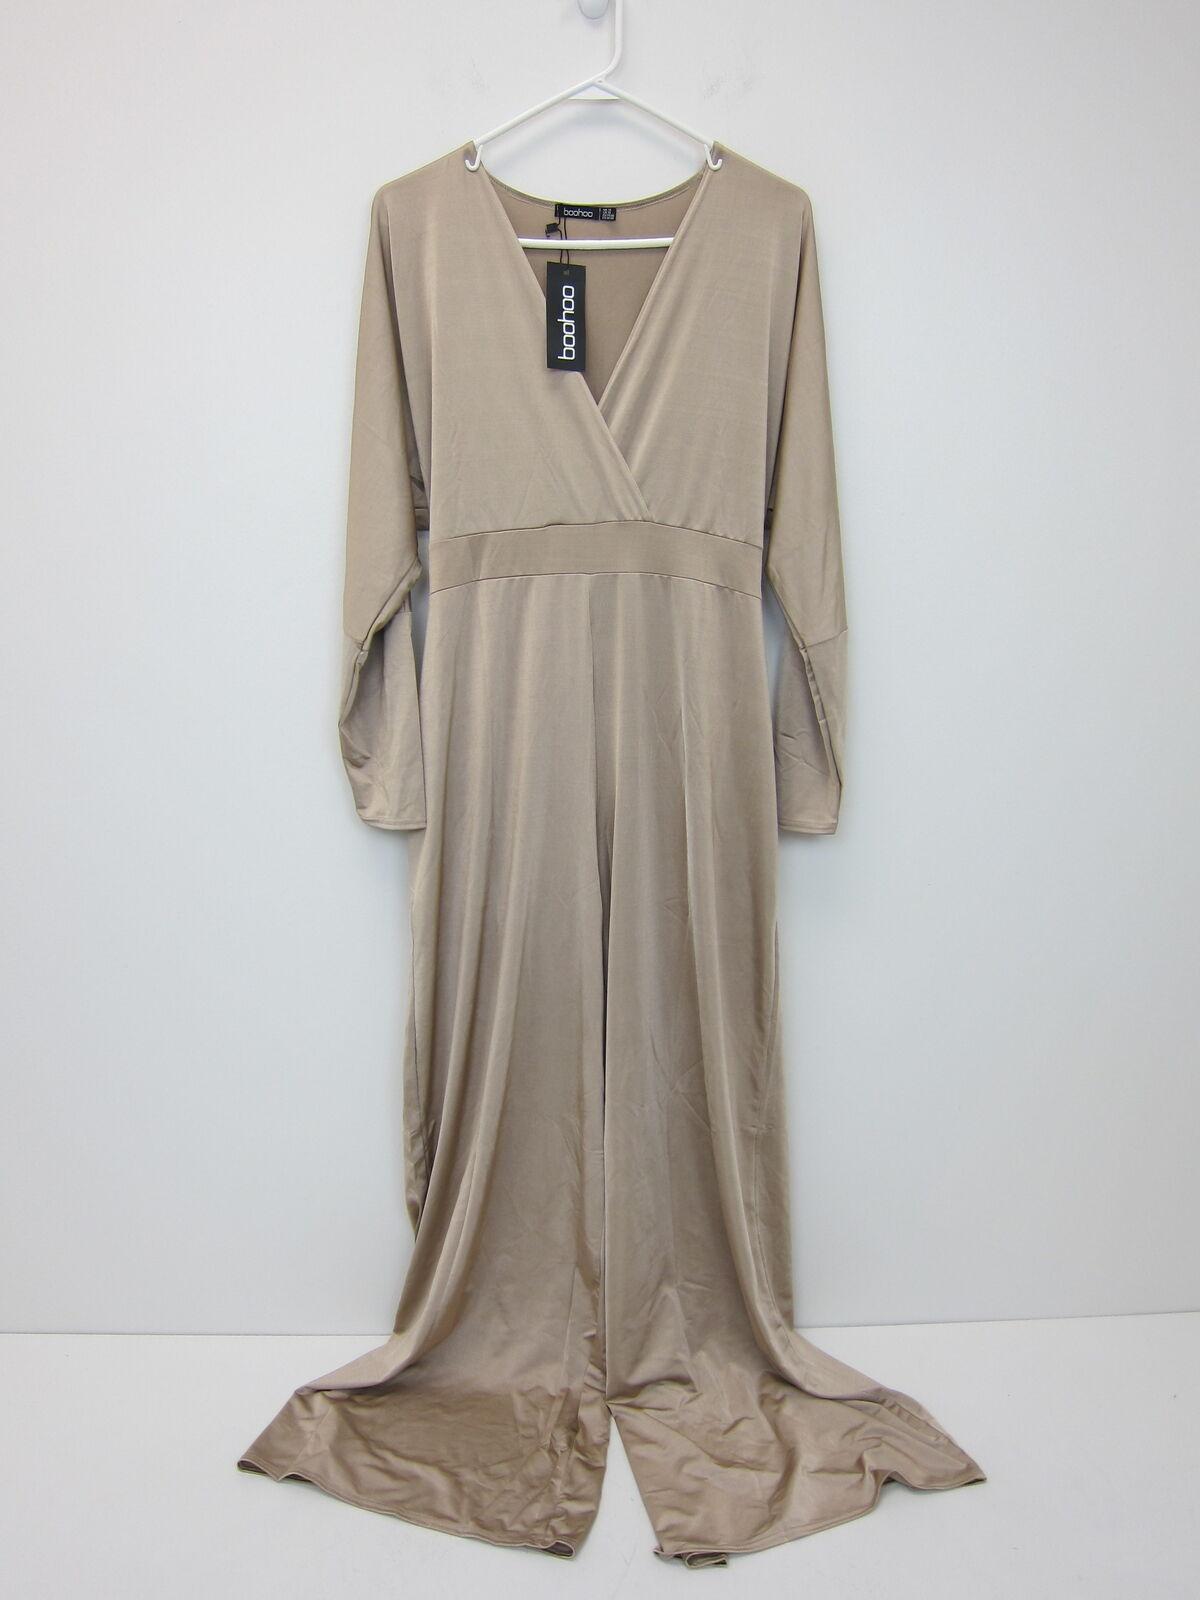 Boohoo Women's Plus Lois Slinky Wrap Tie Jumpsuit US 14 Caramel  NWT